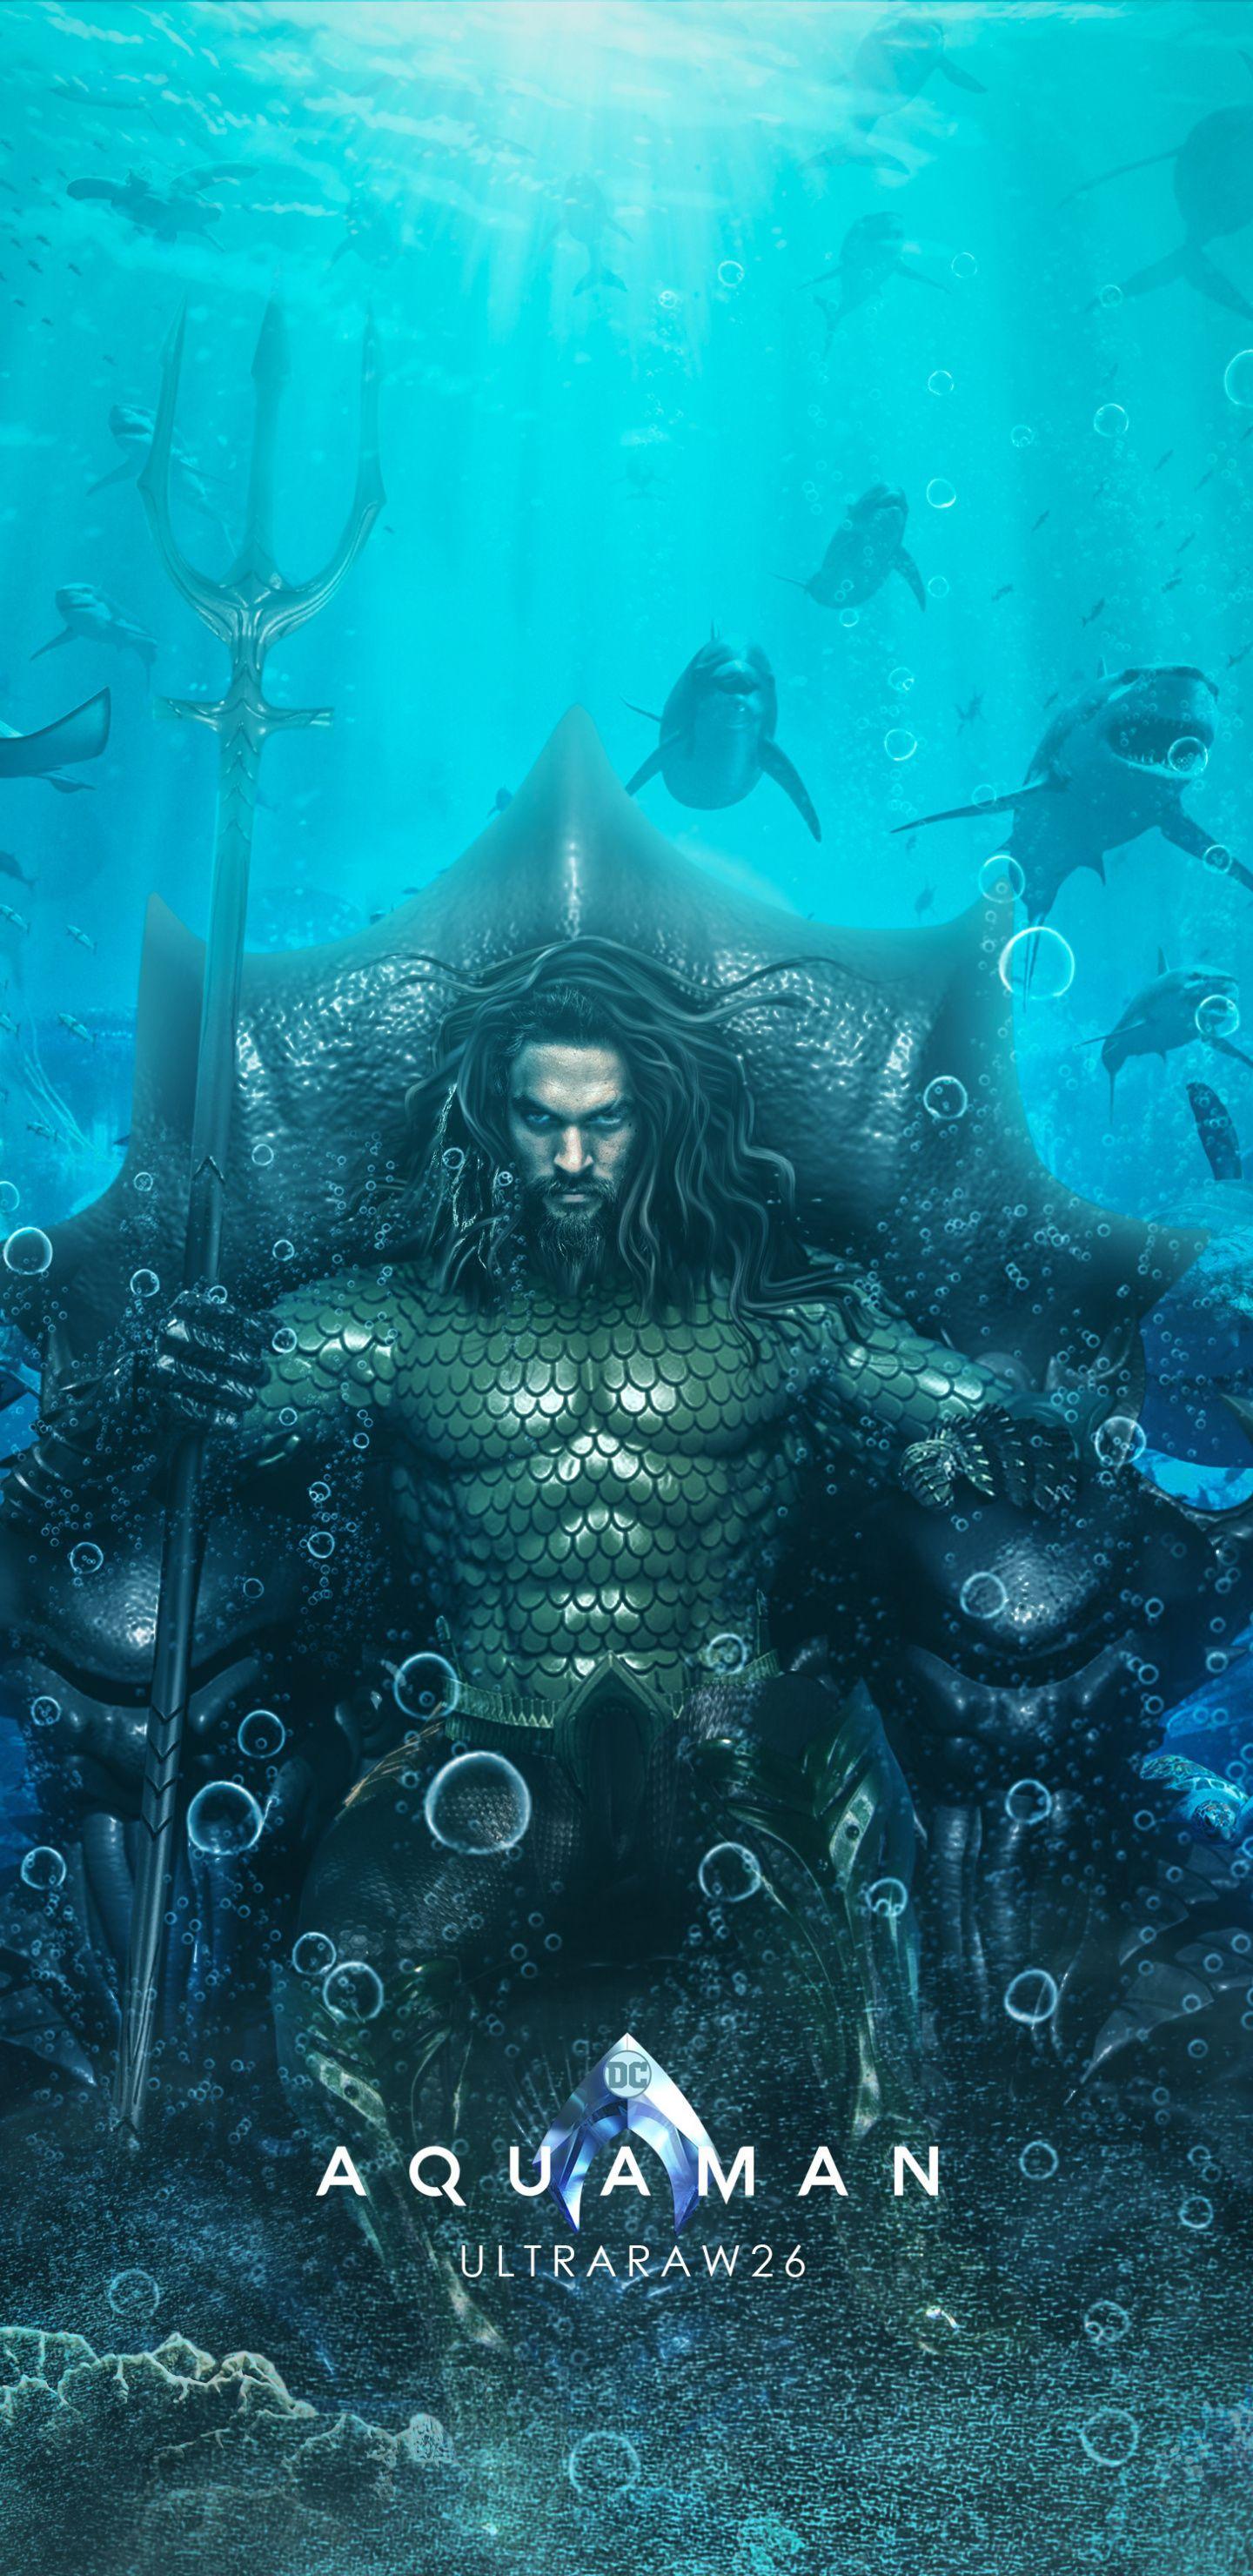 Aquaman, superhero, underwater, DC comics, 1440x2960